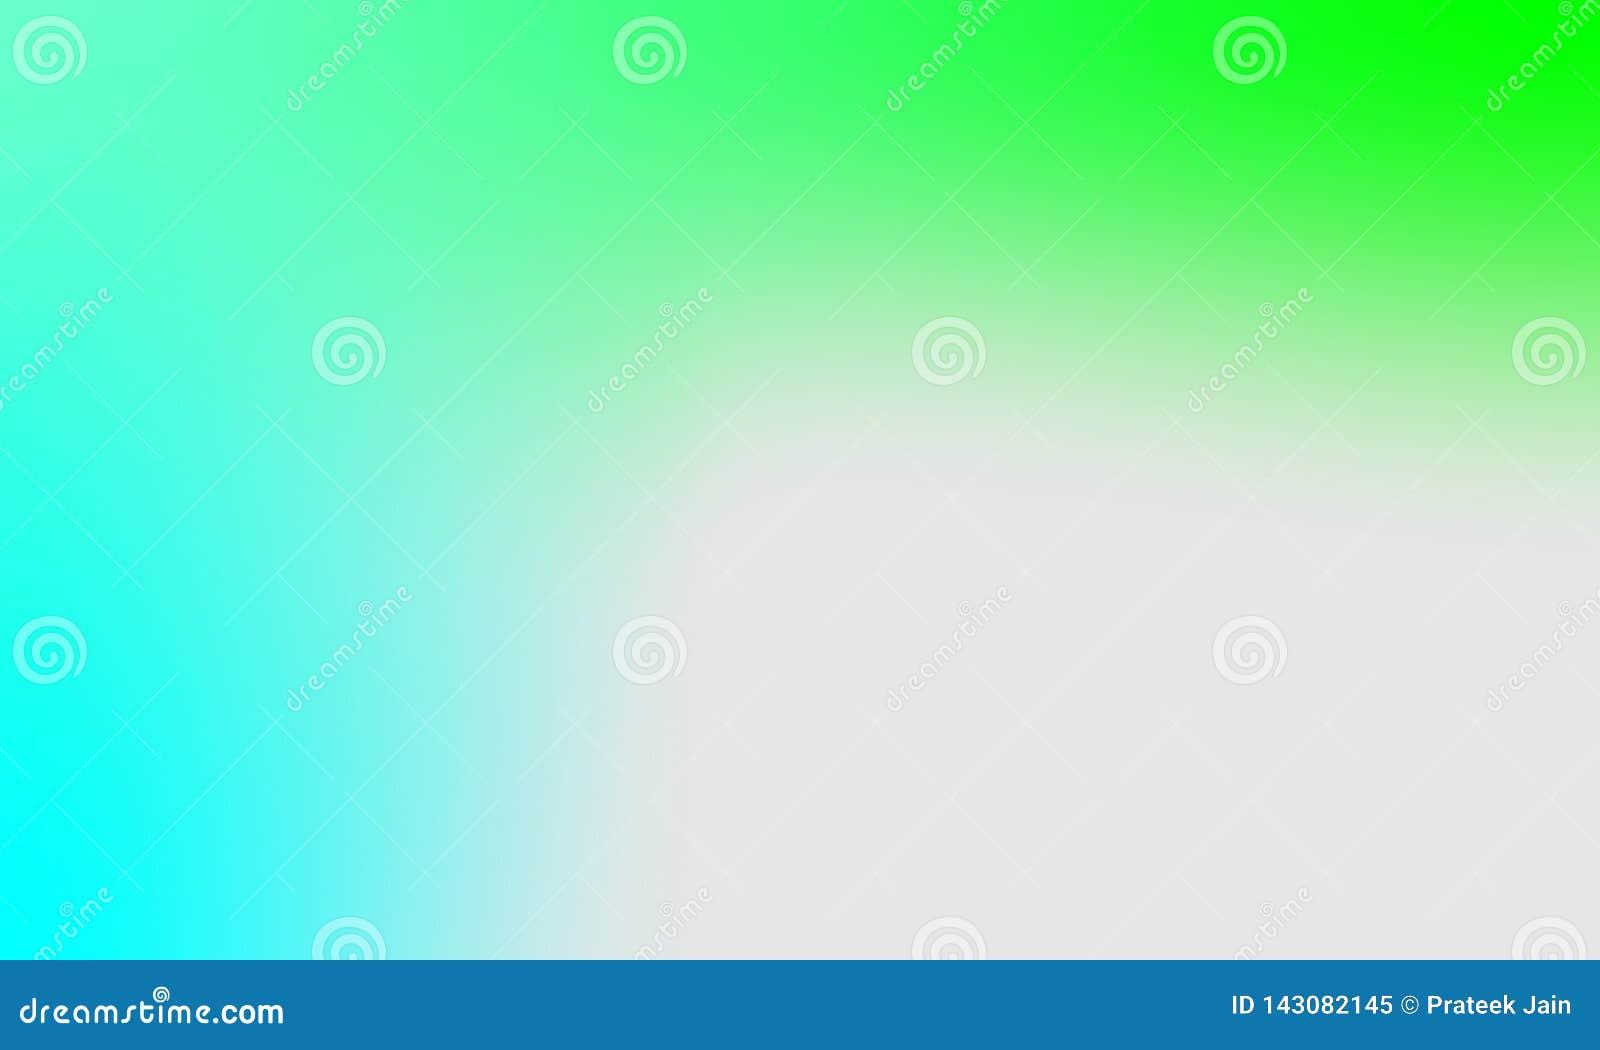 Projeto colorido do vetor do fundo da textura do borr?o, fundo protegido borrado colorido, ilustra??o v?vida do vetor da cor Clos